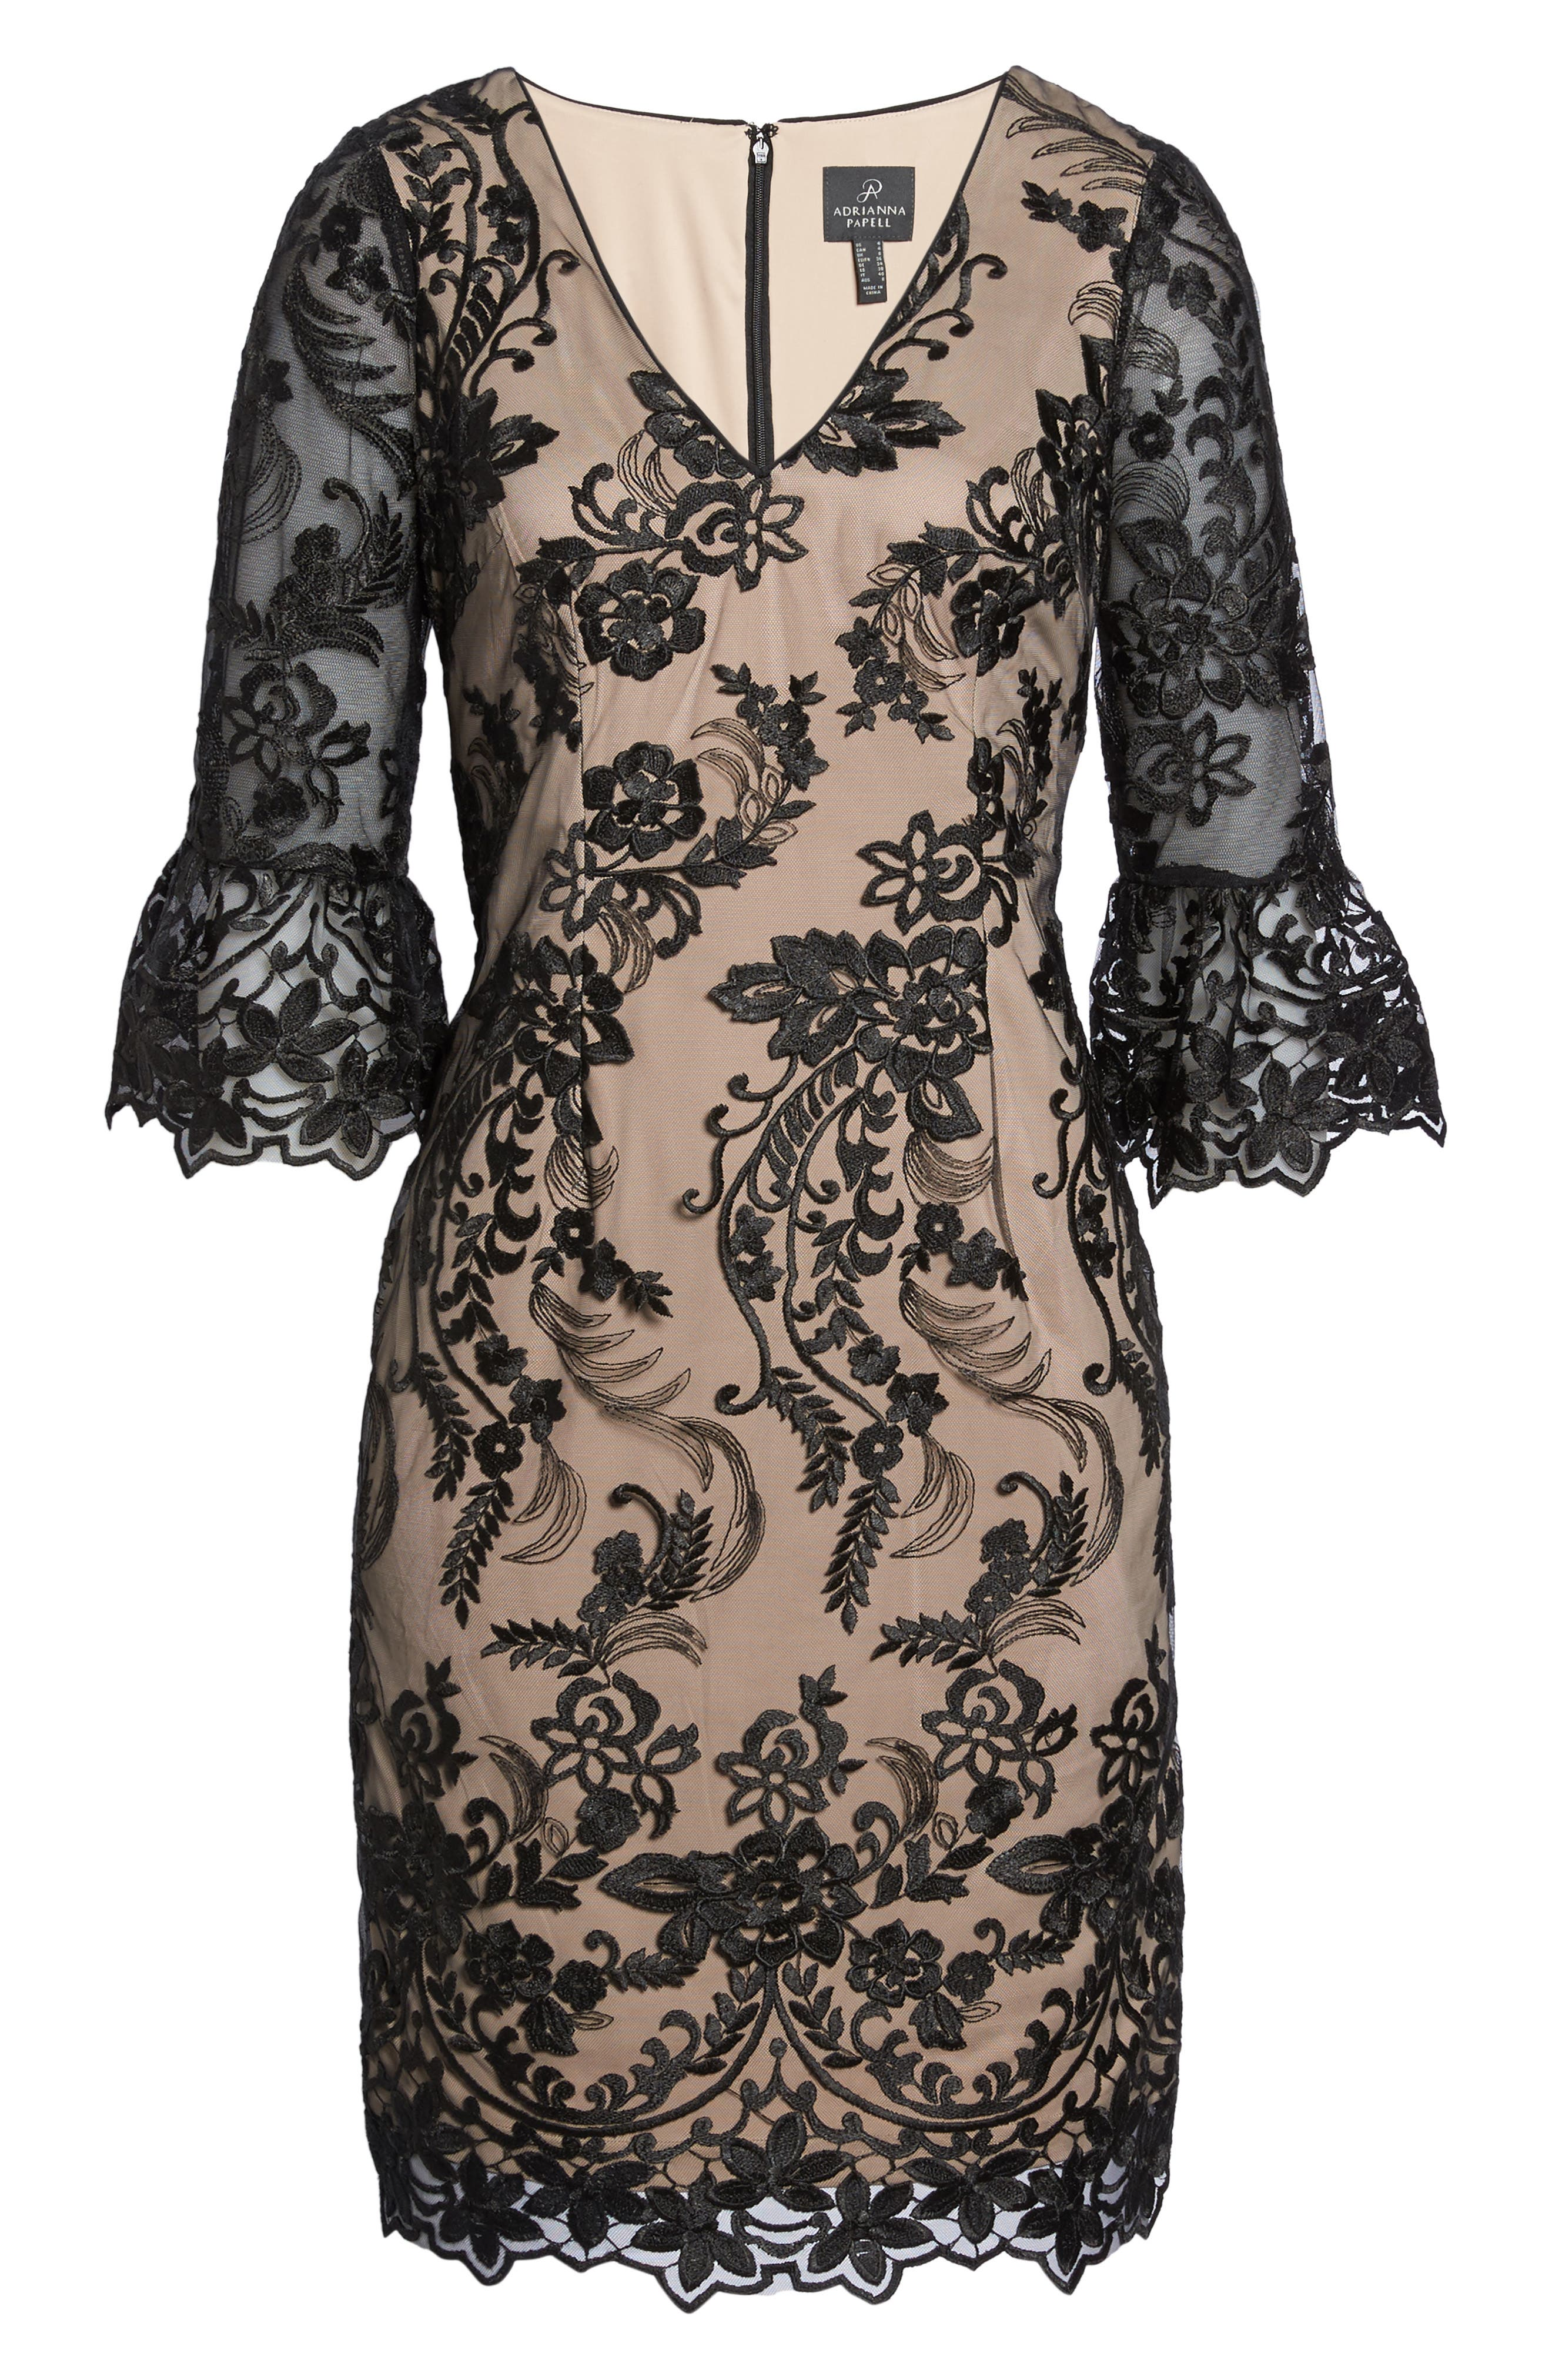 Eillen Embroidered Lace Dress,                             Alternate thumbnail 6, color,                             017